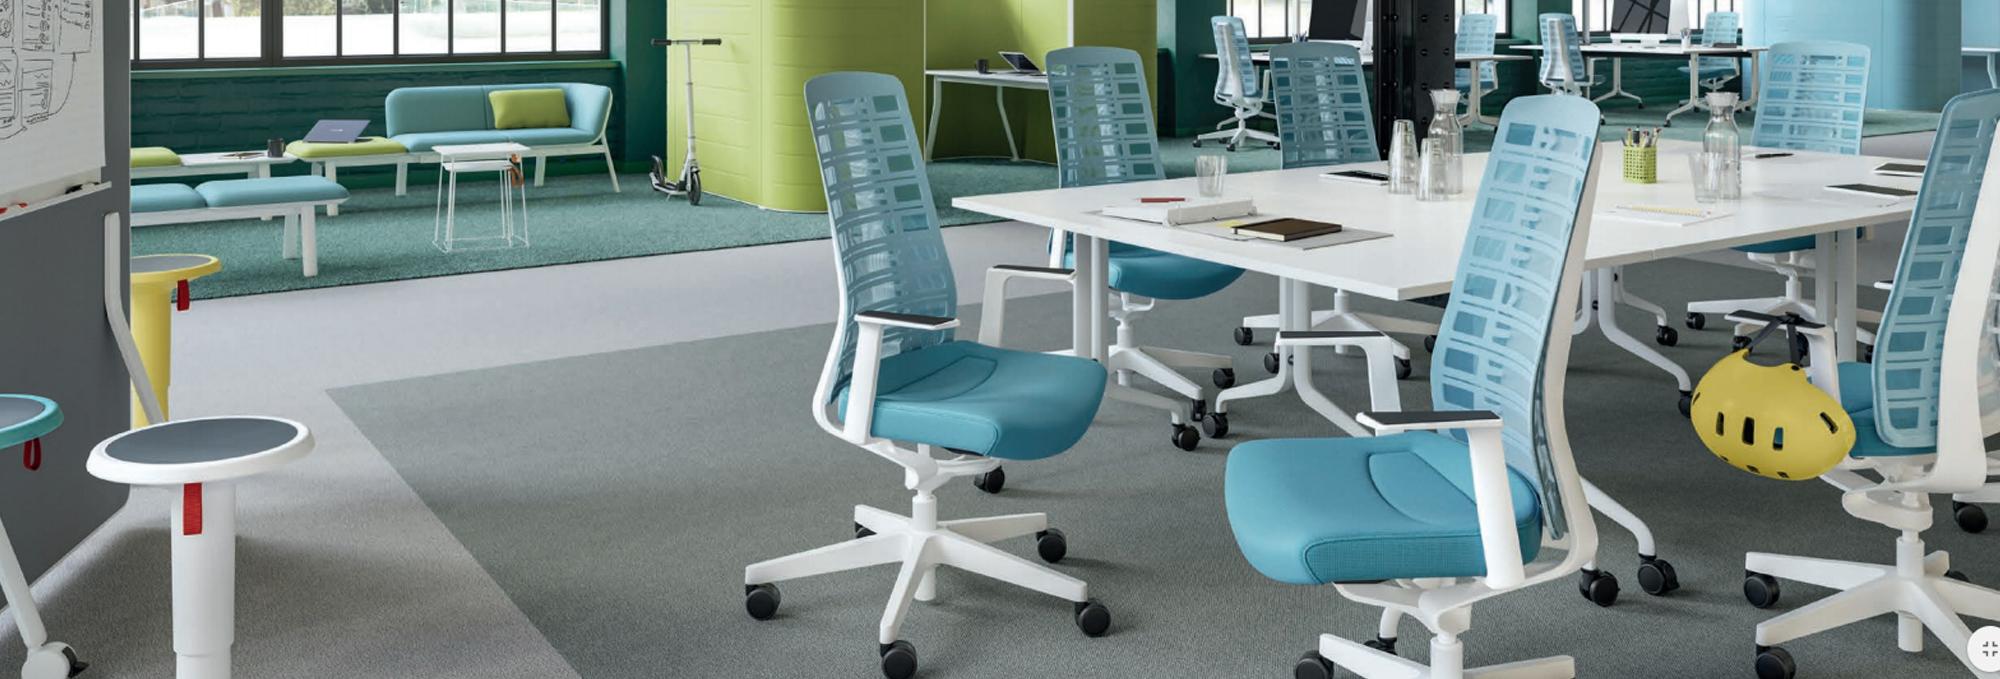 Interstuhl pure office chair